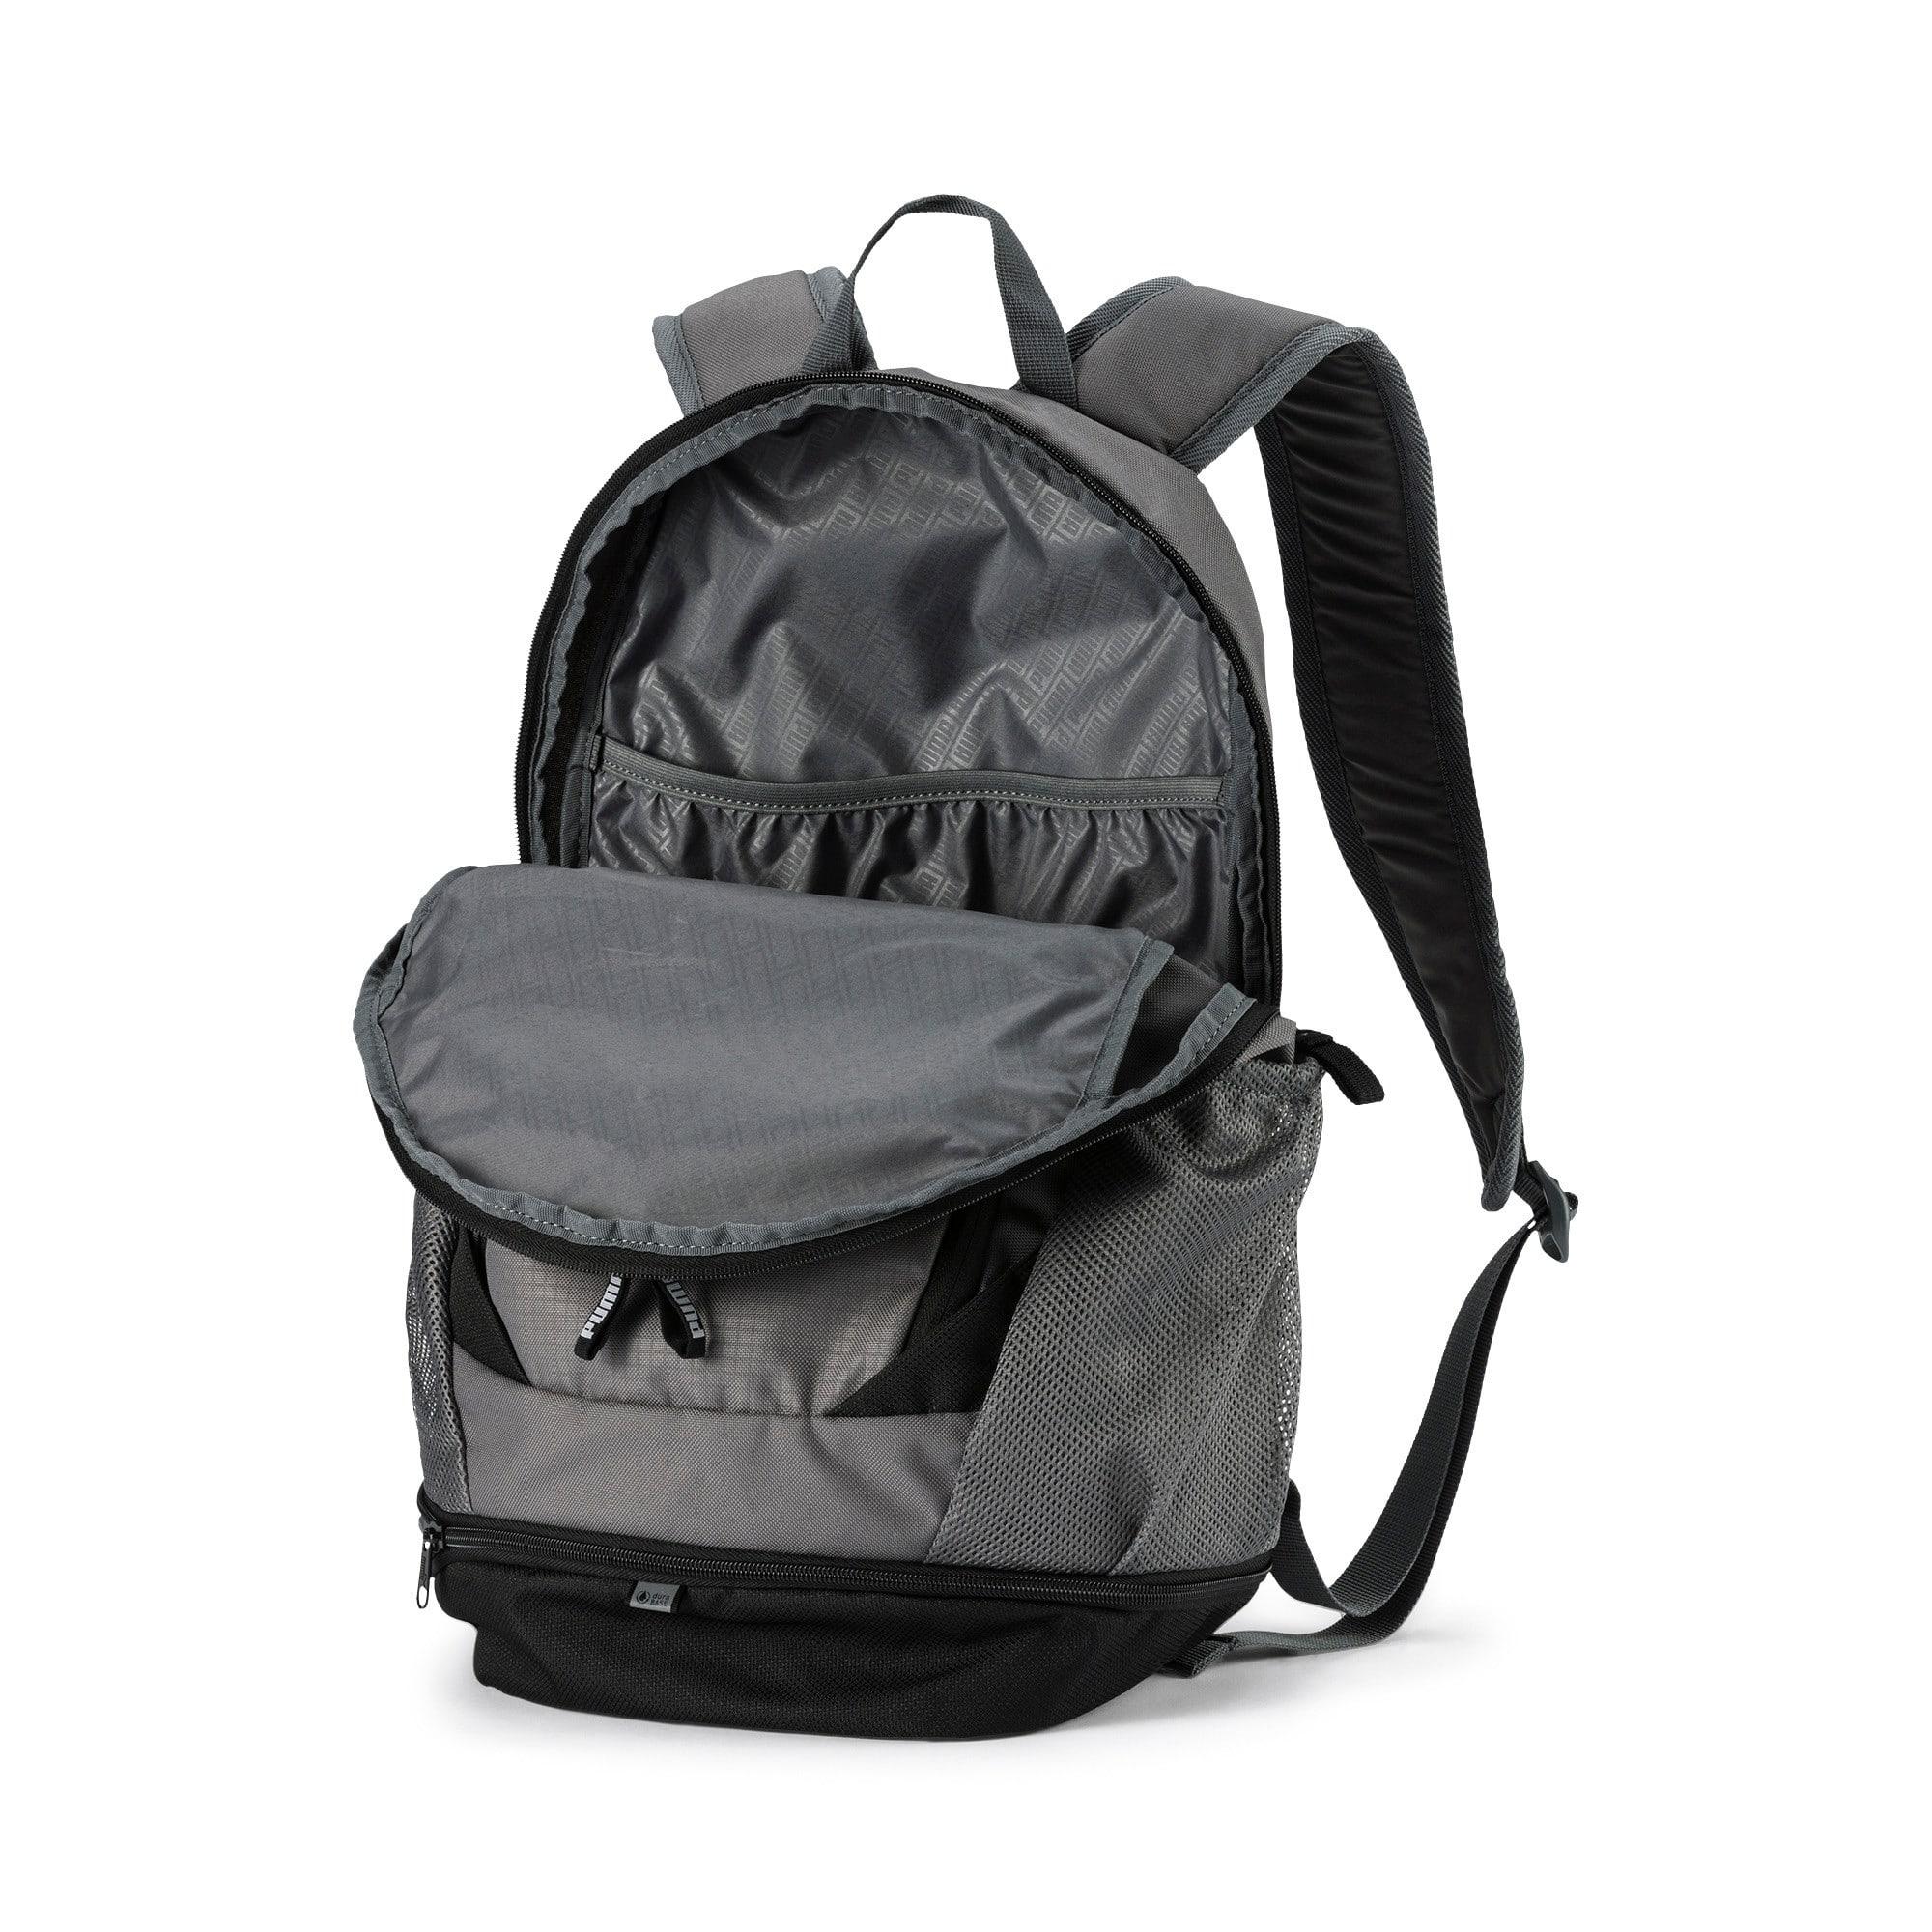 Thumbnail 3 of Vibe Backpack, CASTLEROCK, medium